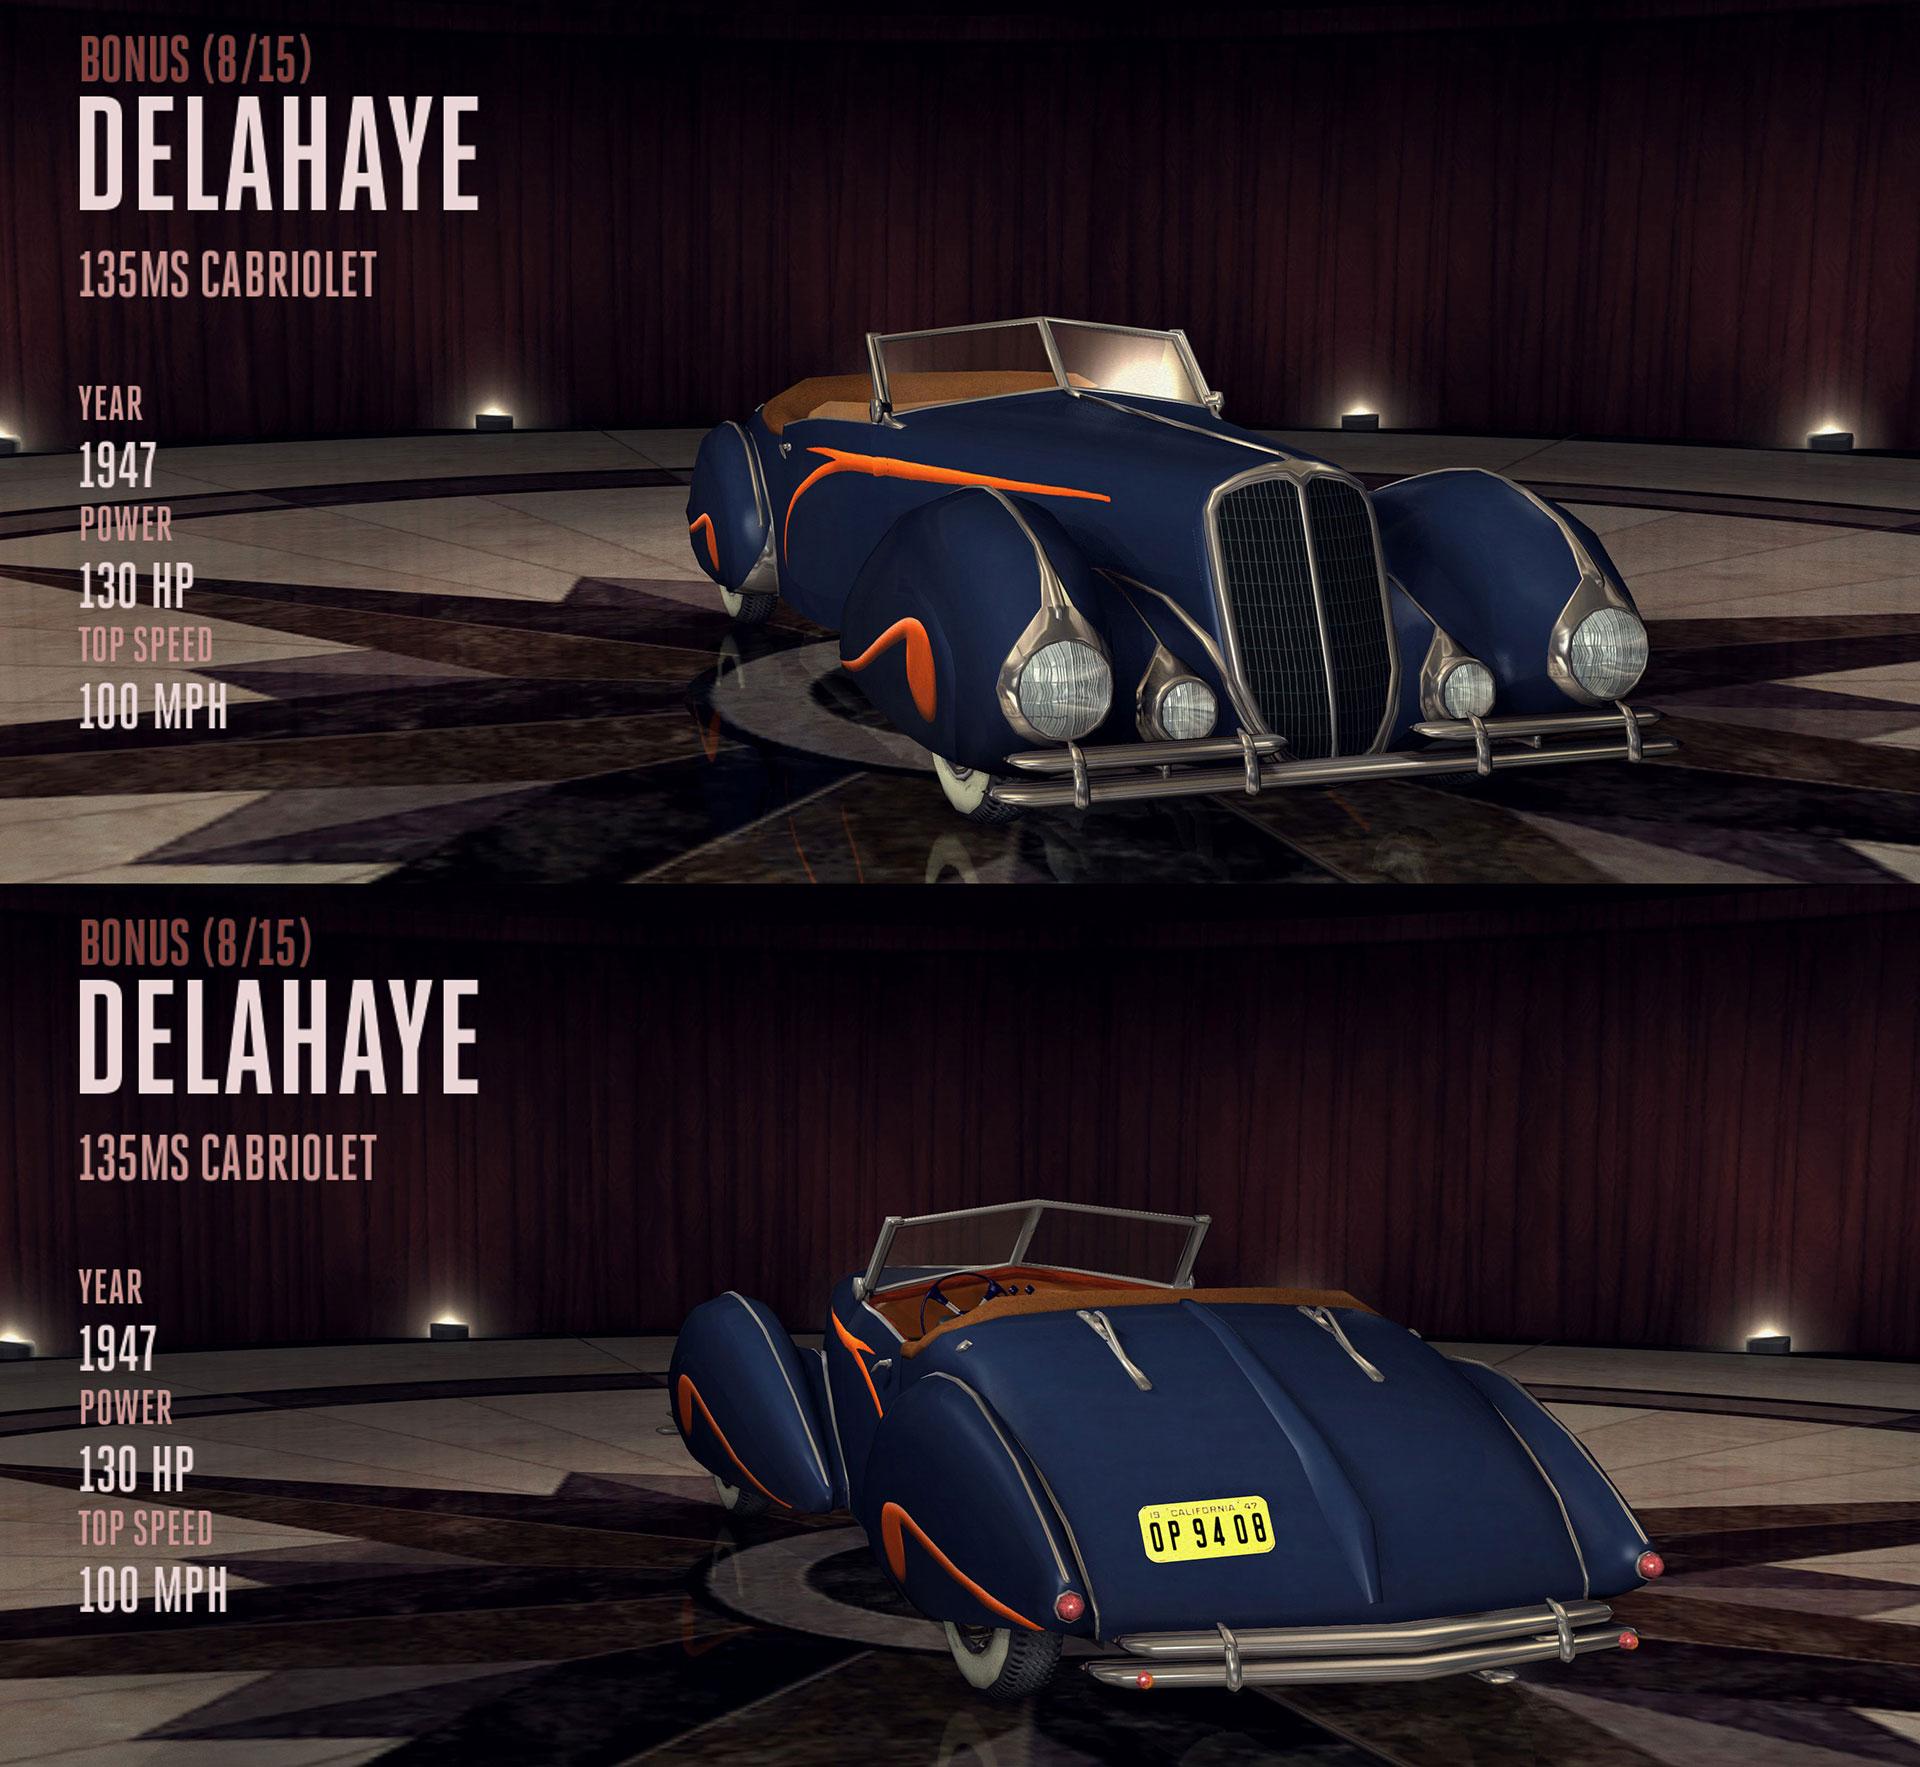 File:1947-delahaye-135ms-cabriolet.jpg